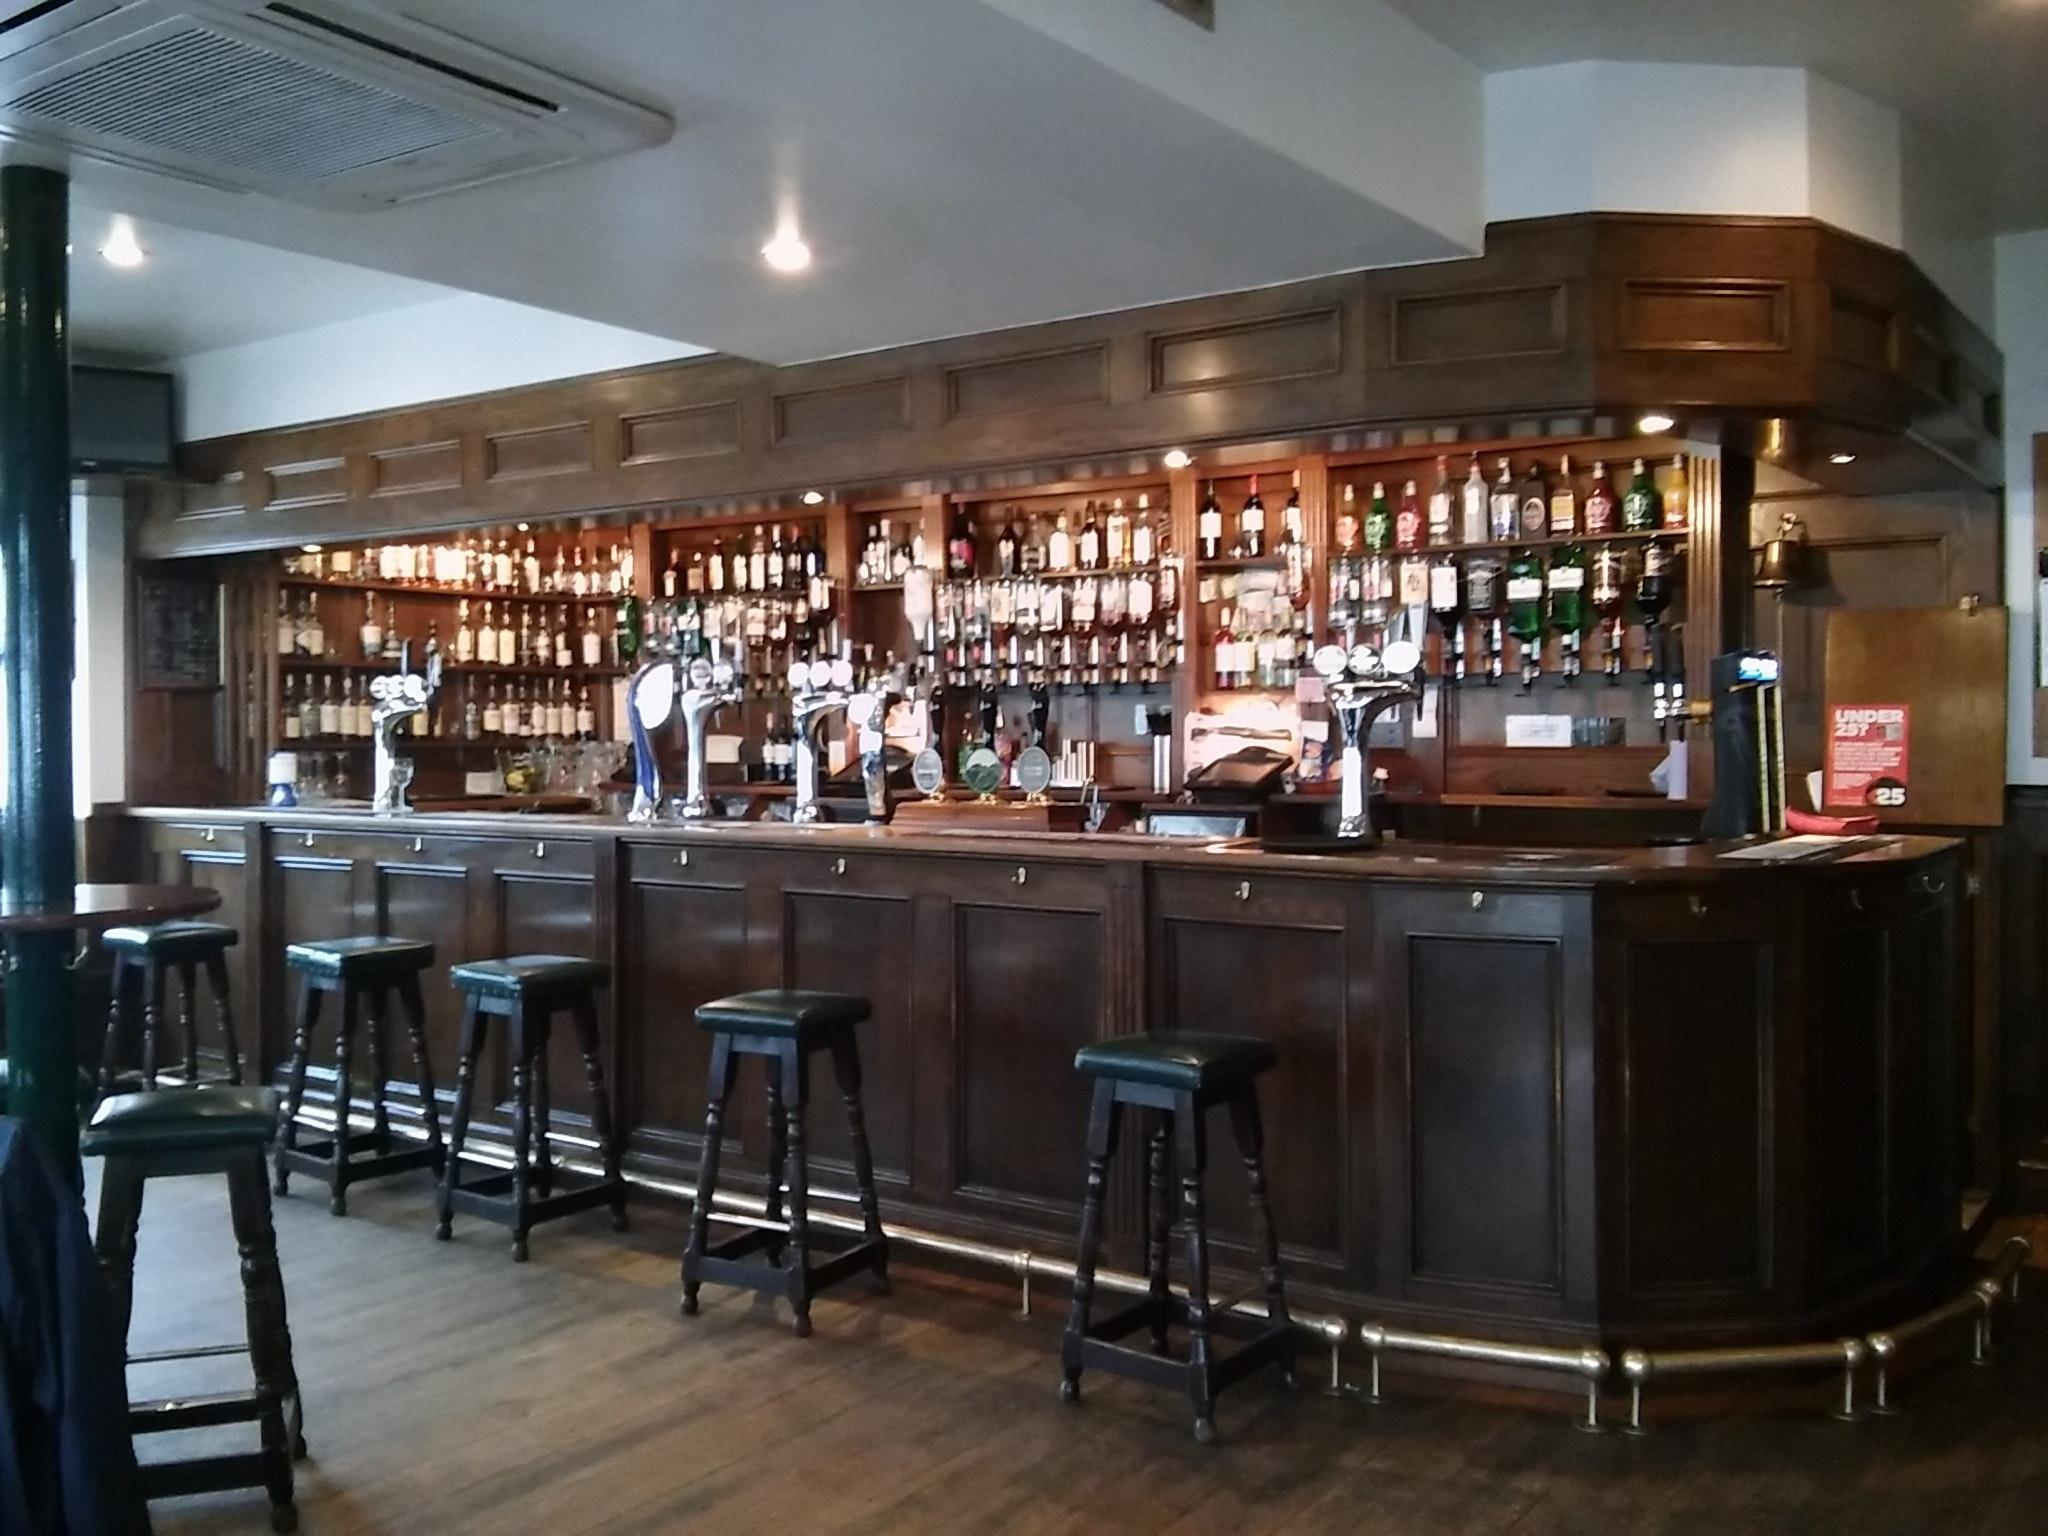 Kneipe Bar